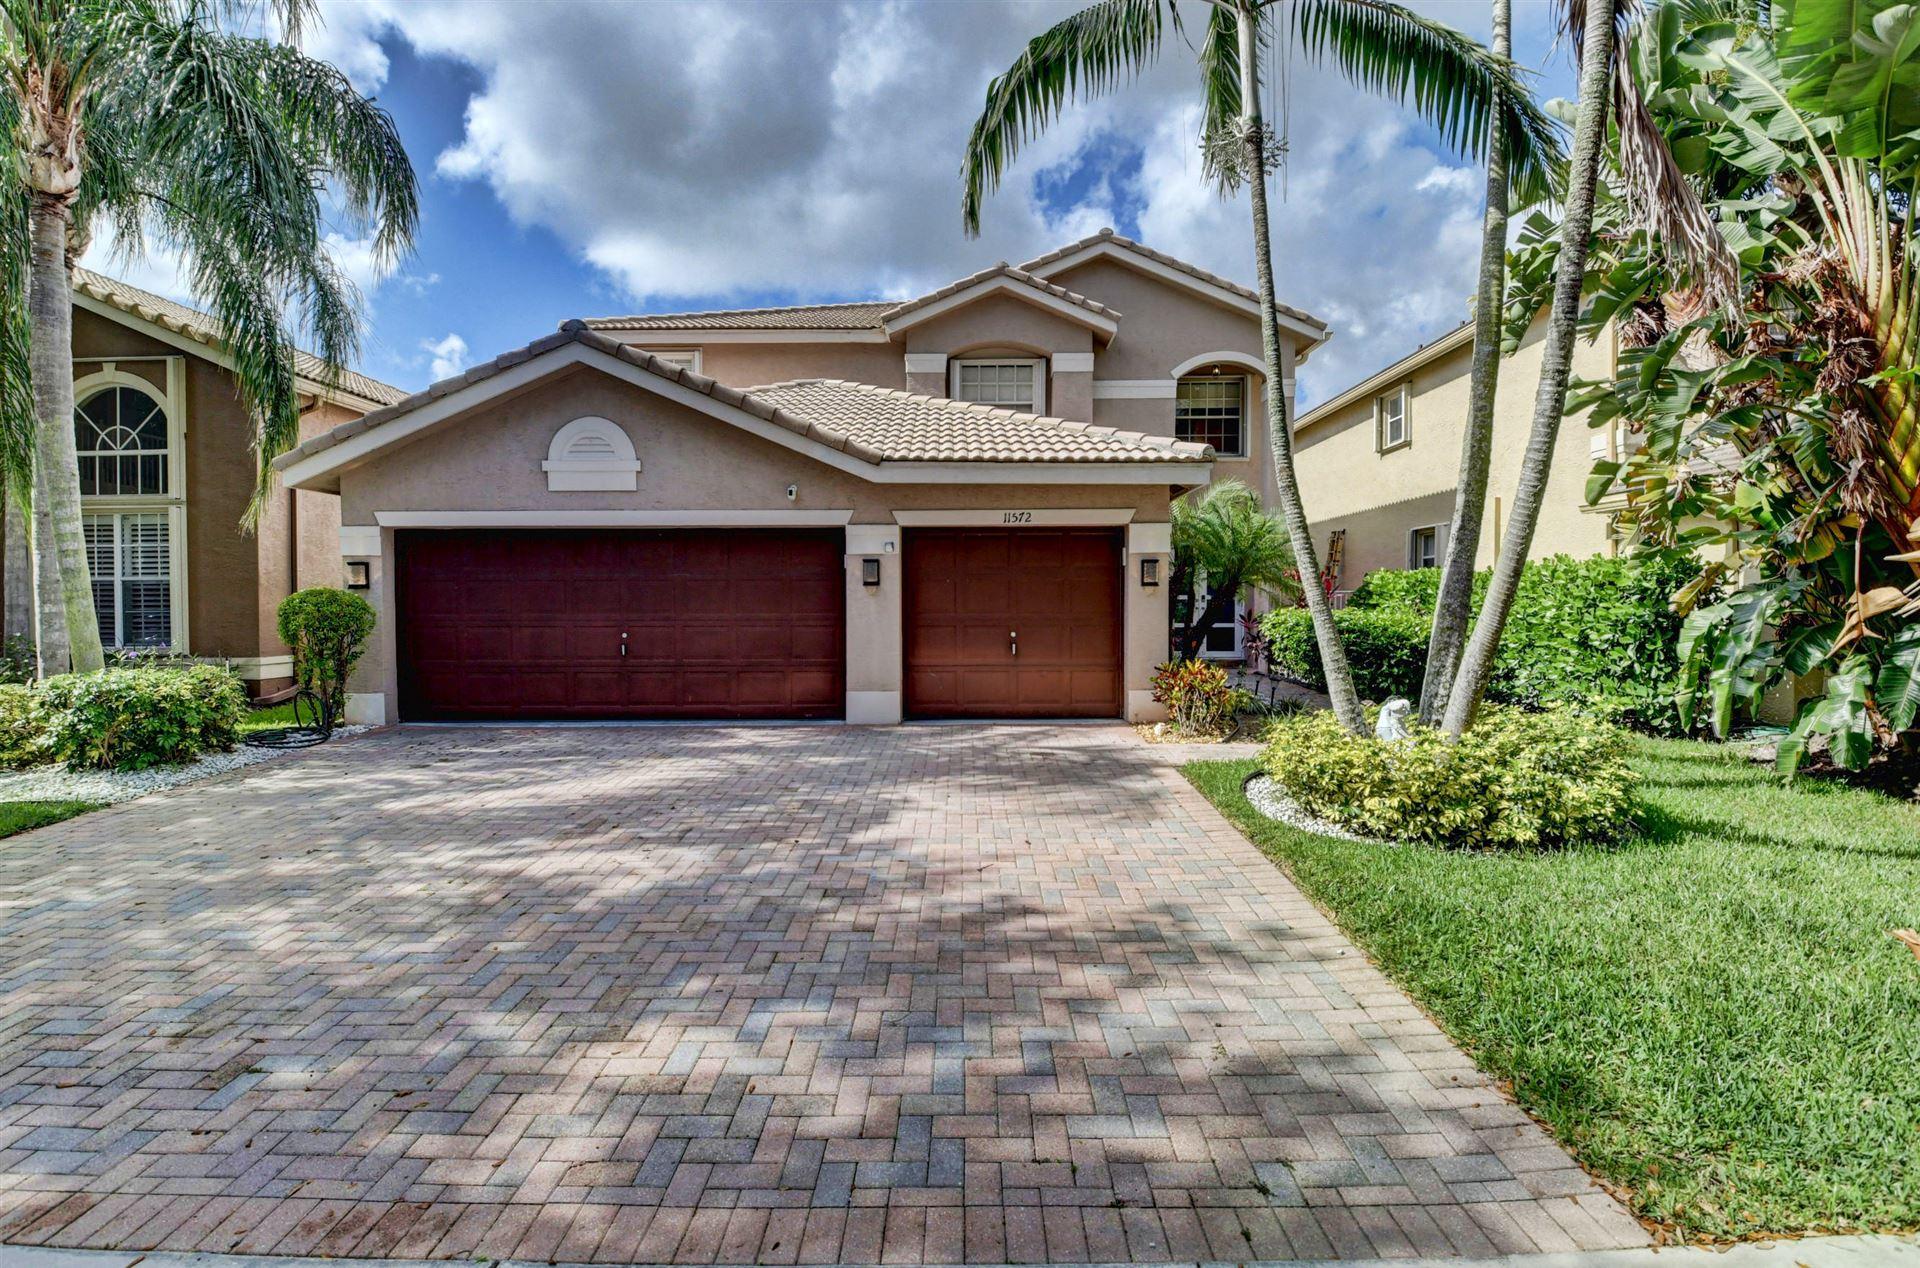 11572 Big Sky Court, Boca Raton, FL 33498 - #: RX-10731756